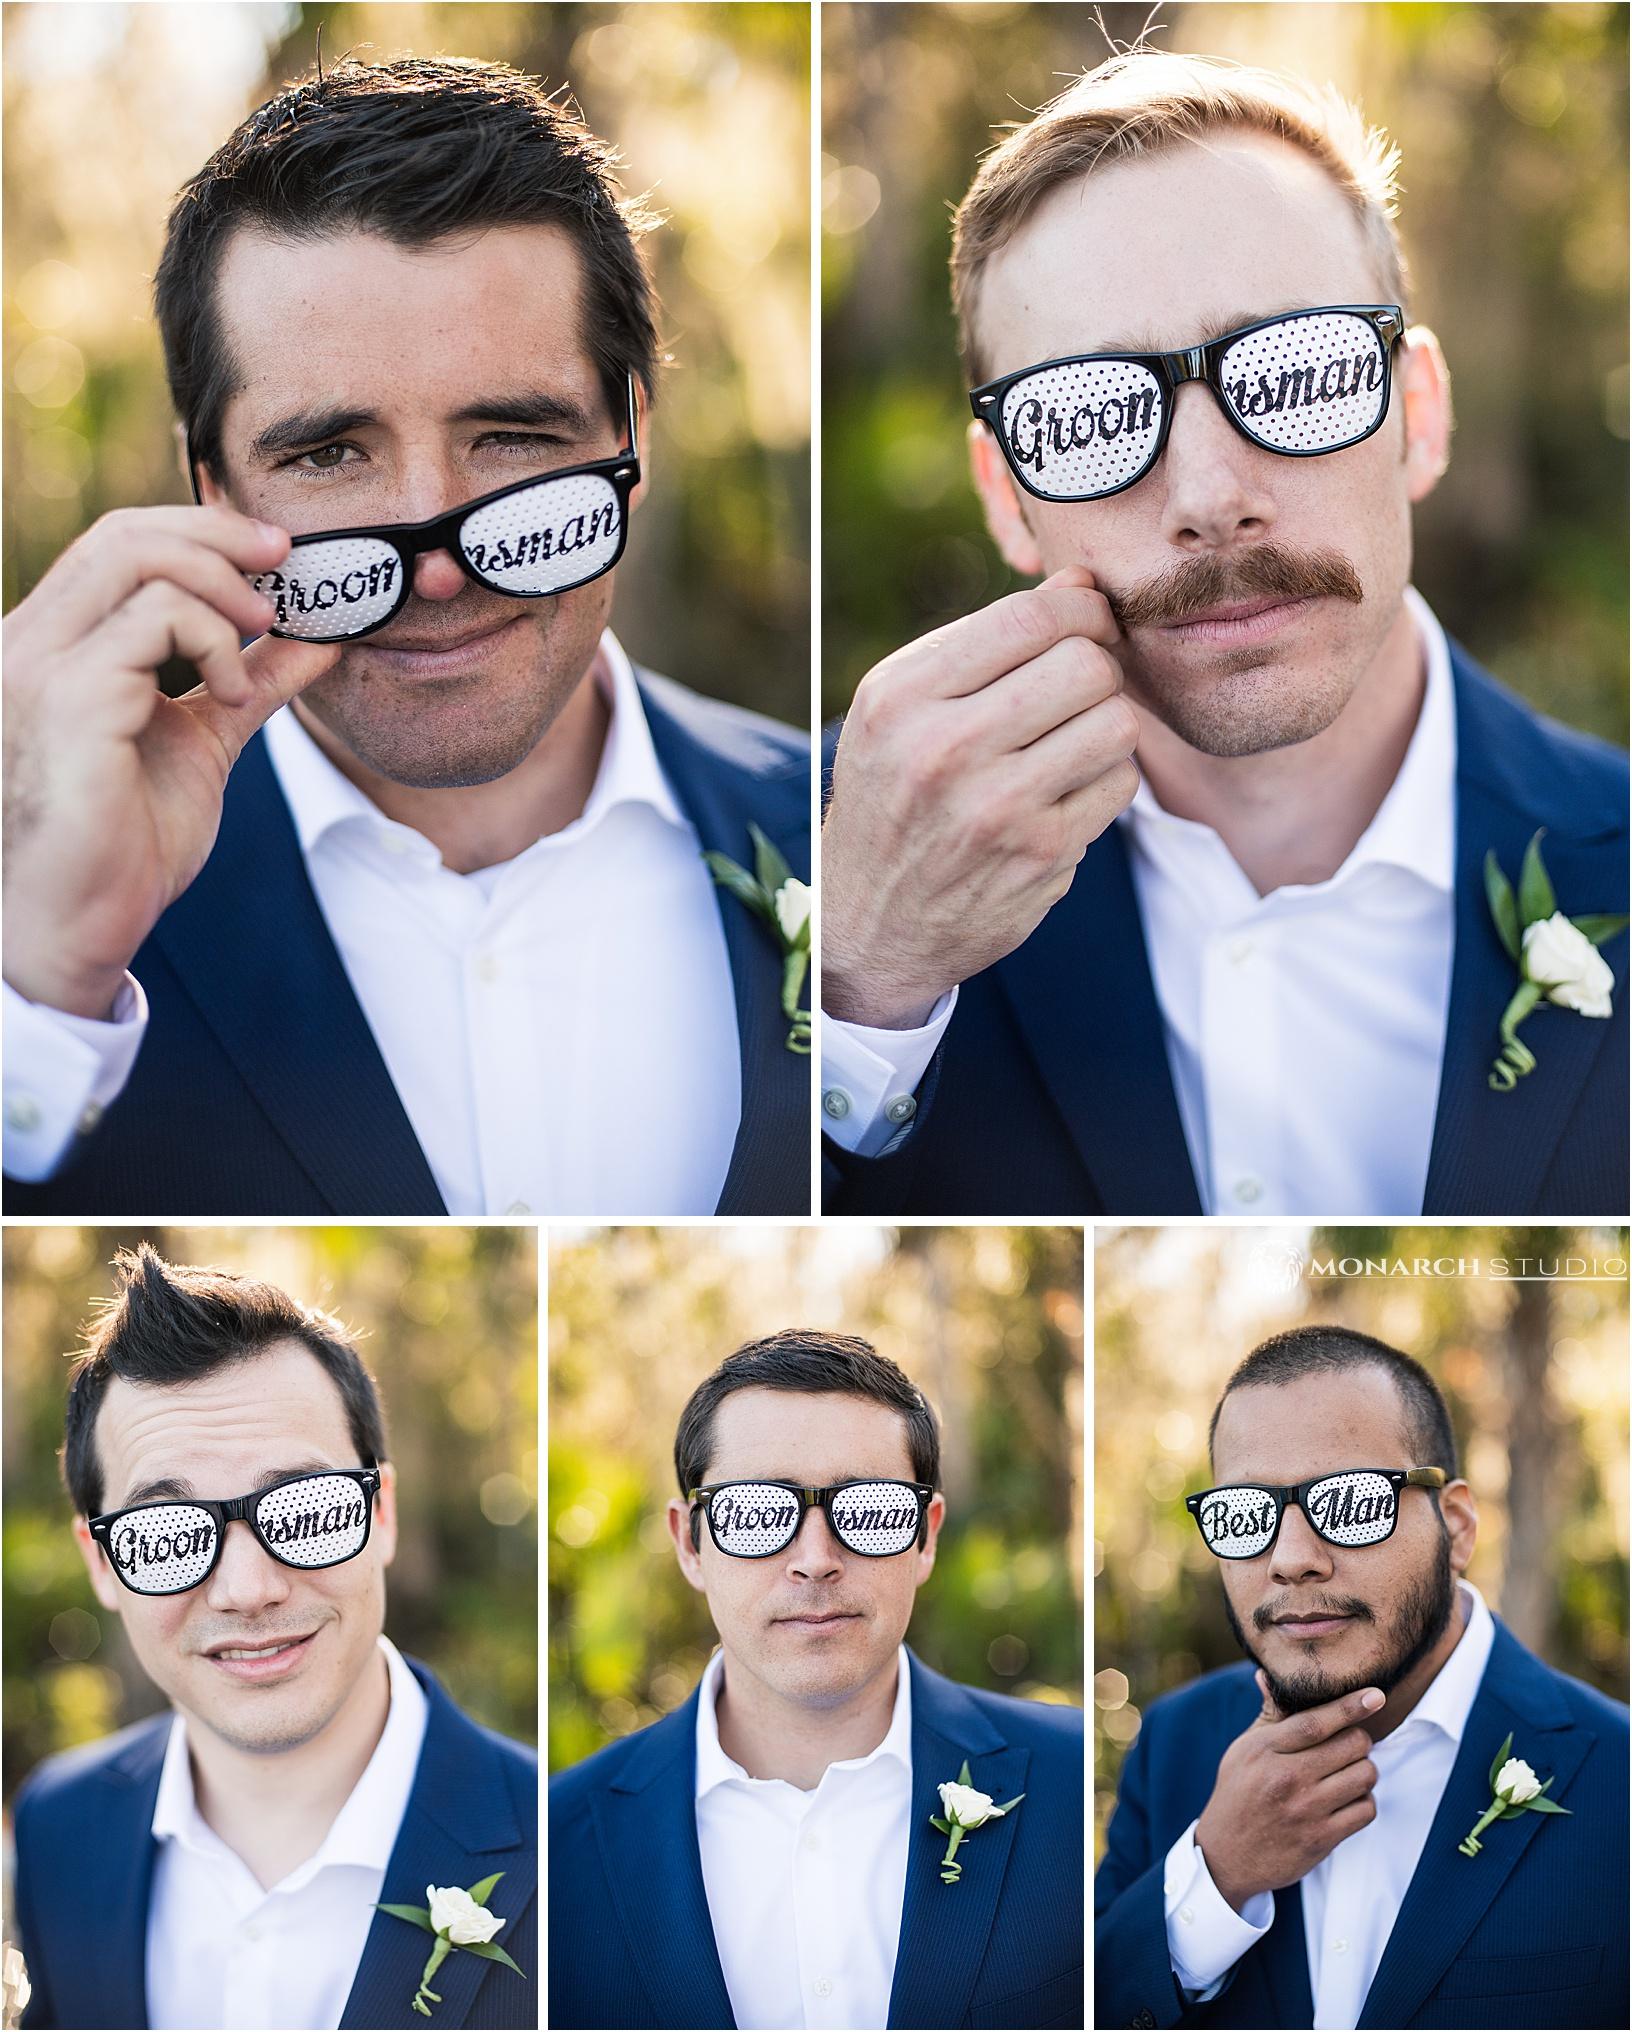 Wedding-photographer-in-sanford-florida-natural-wedding-021.jpg